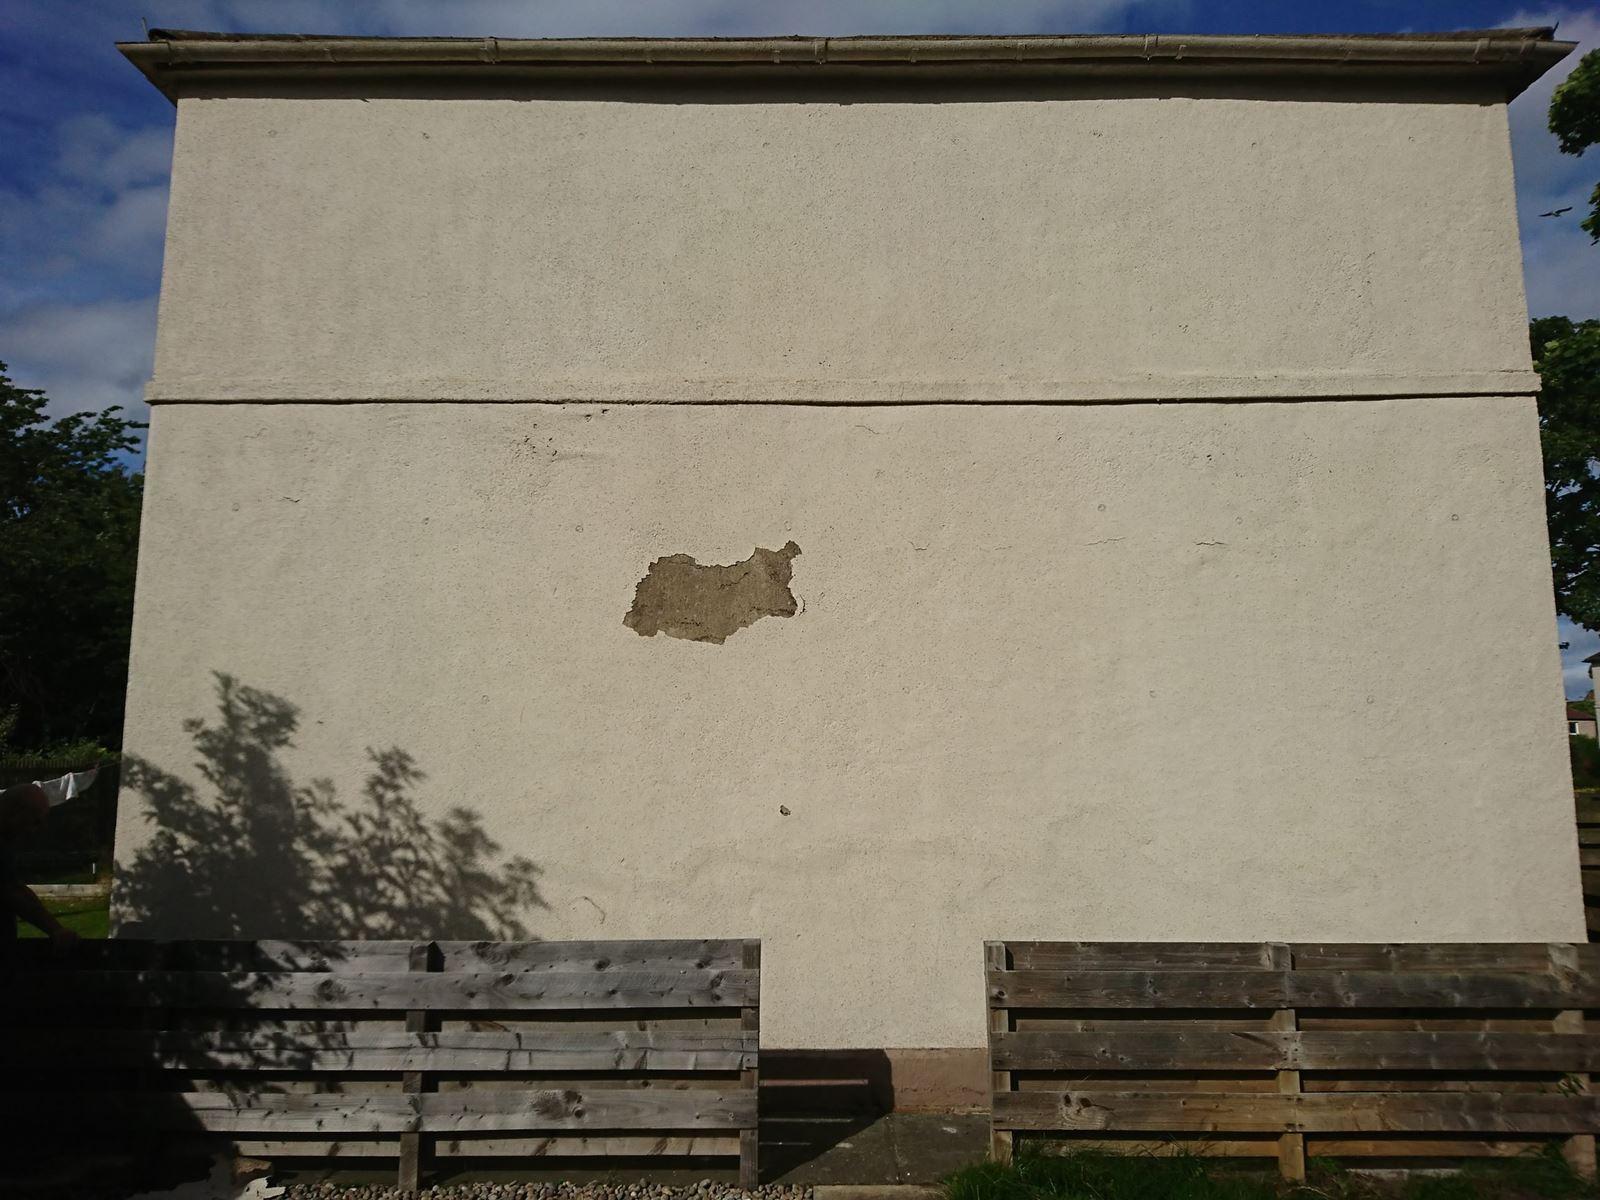 roughcast-repair-edinburgh-roughcast-render-edinburgh